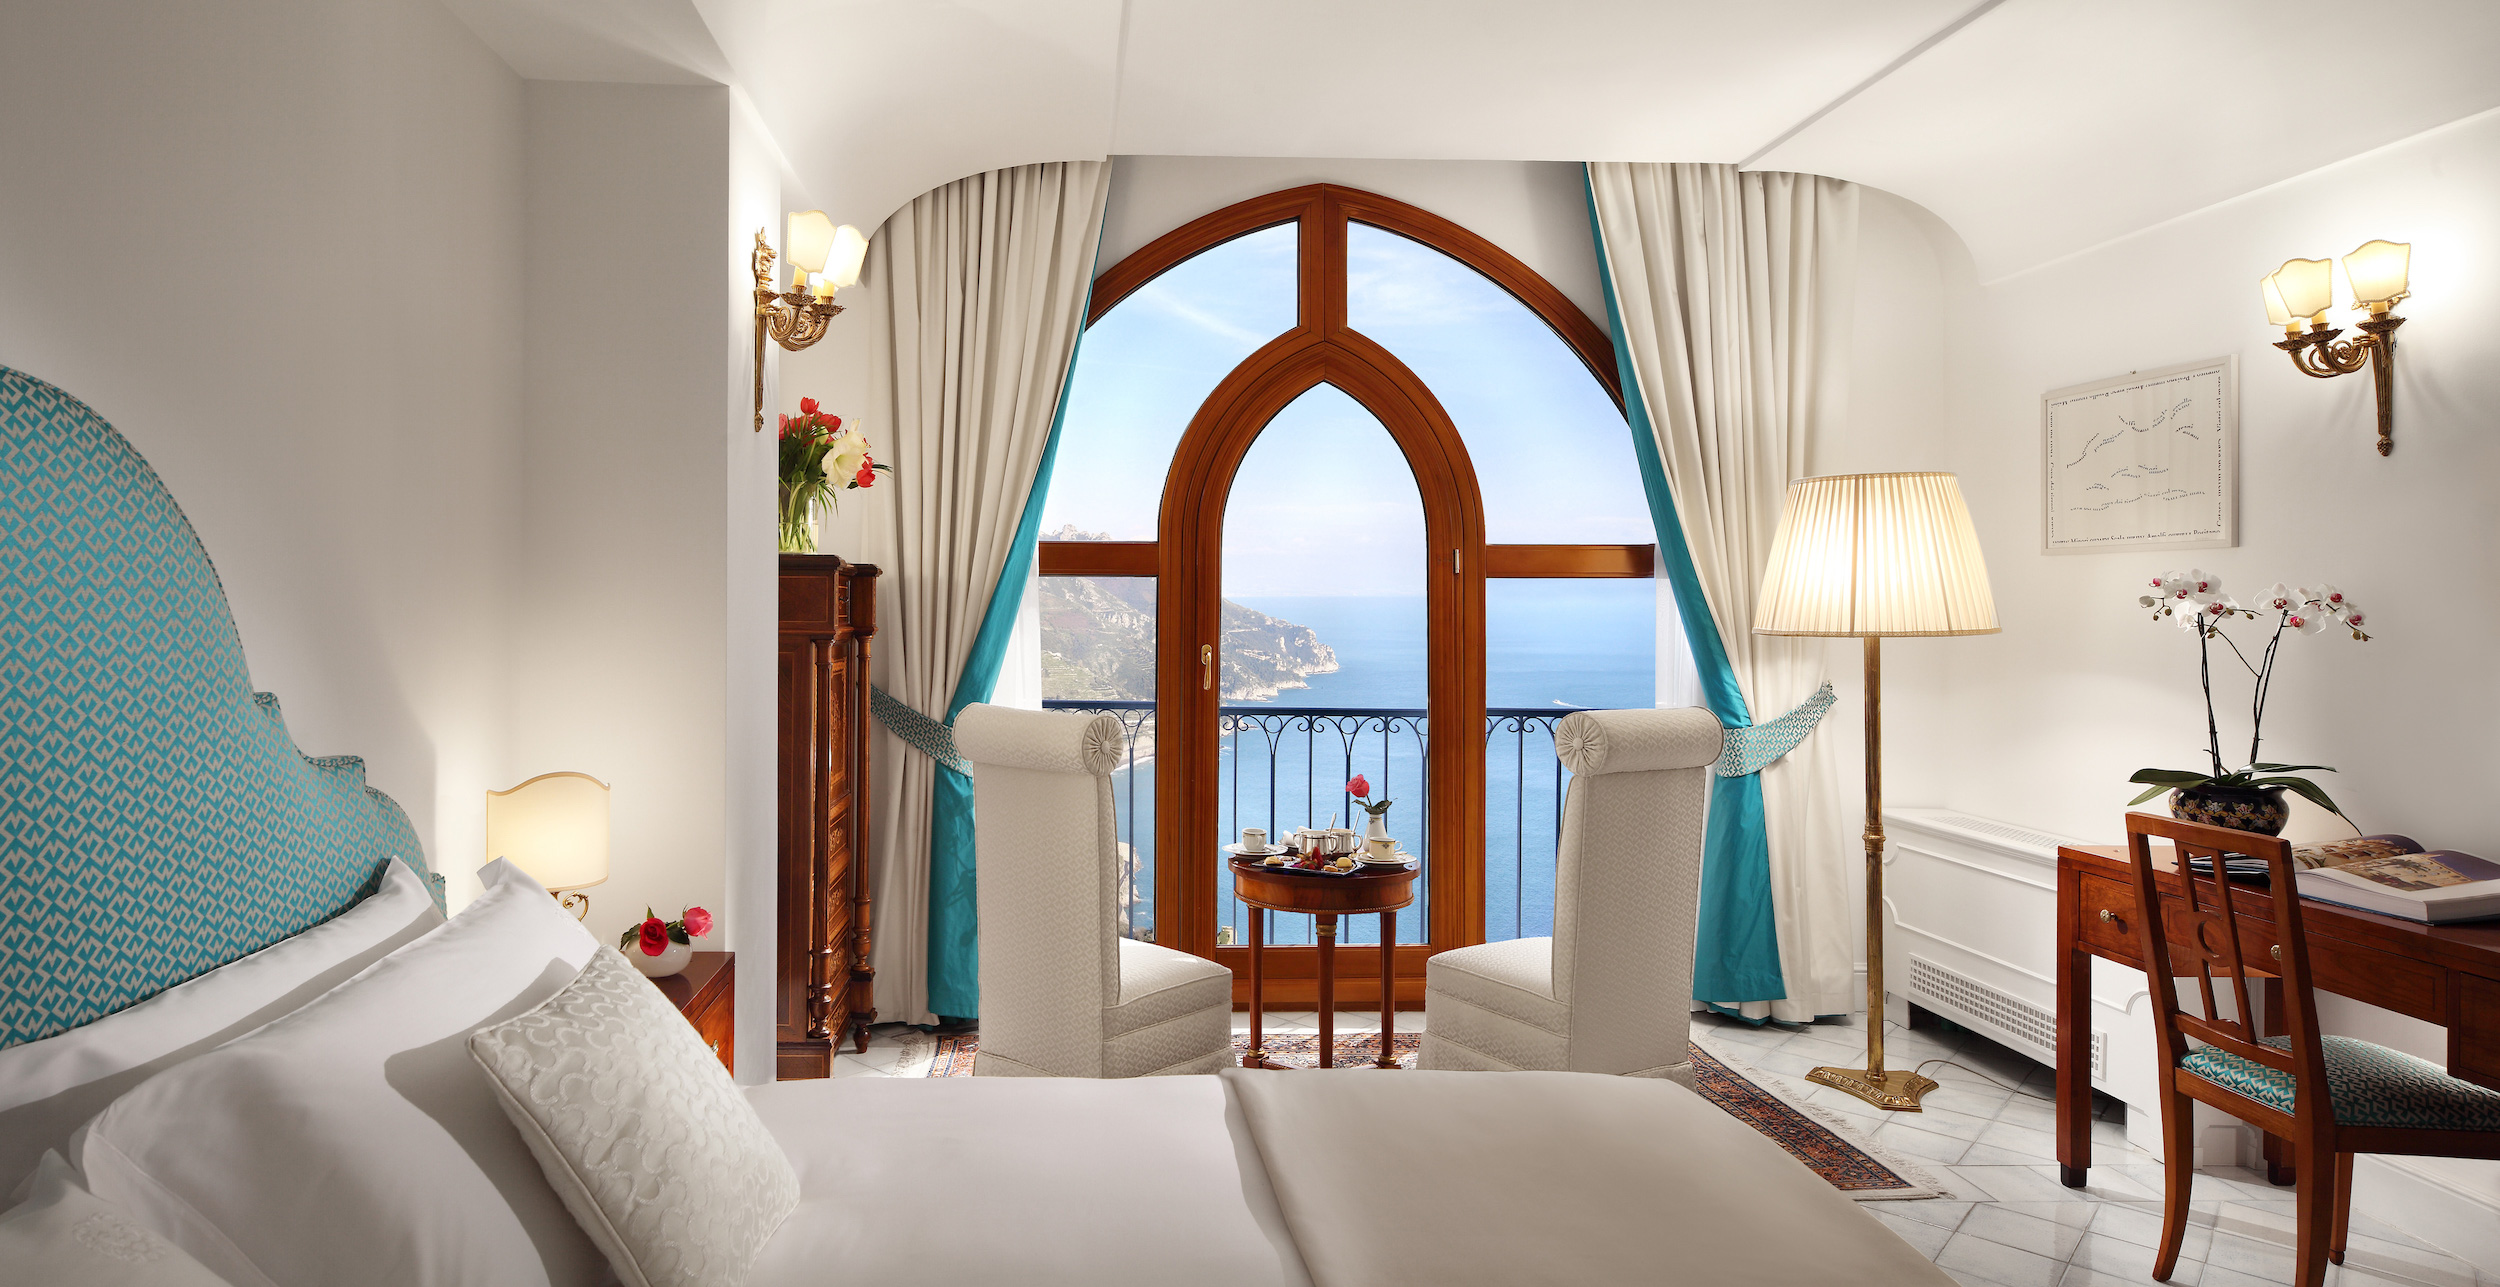 palazzo-avino-deluxe-sea-view-room-2.jpg